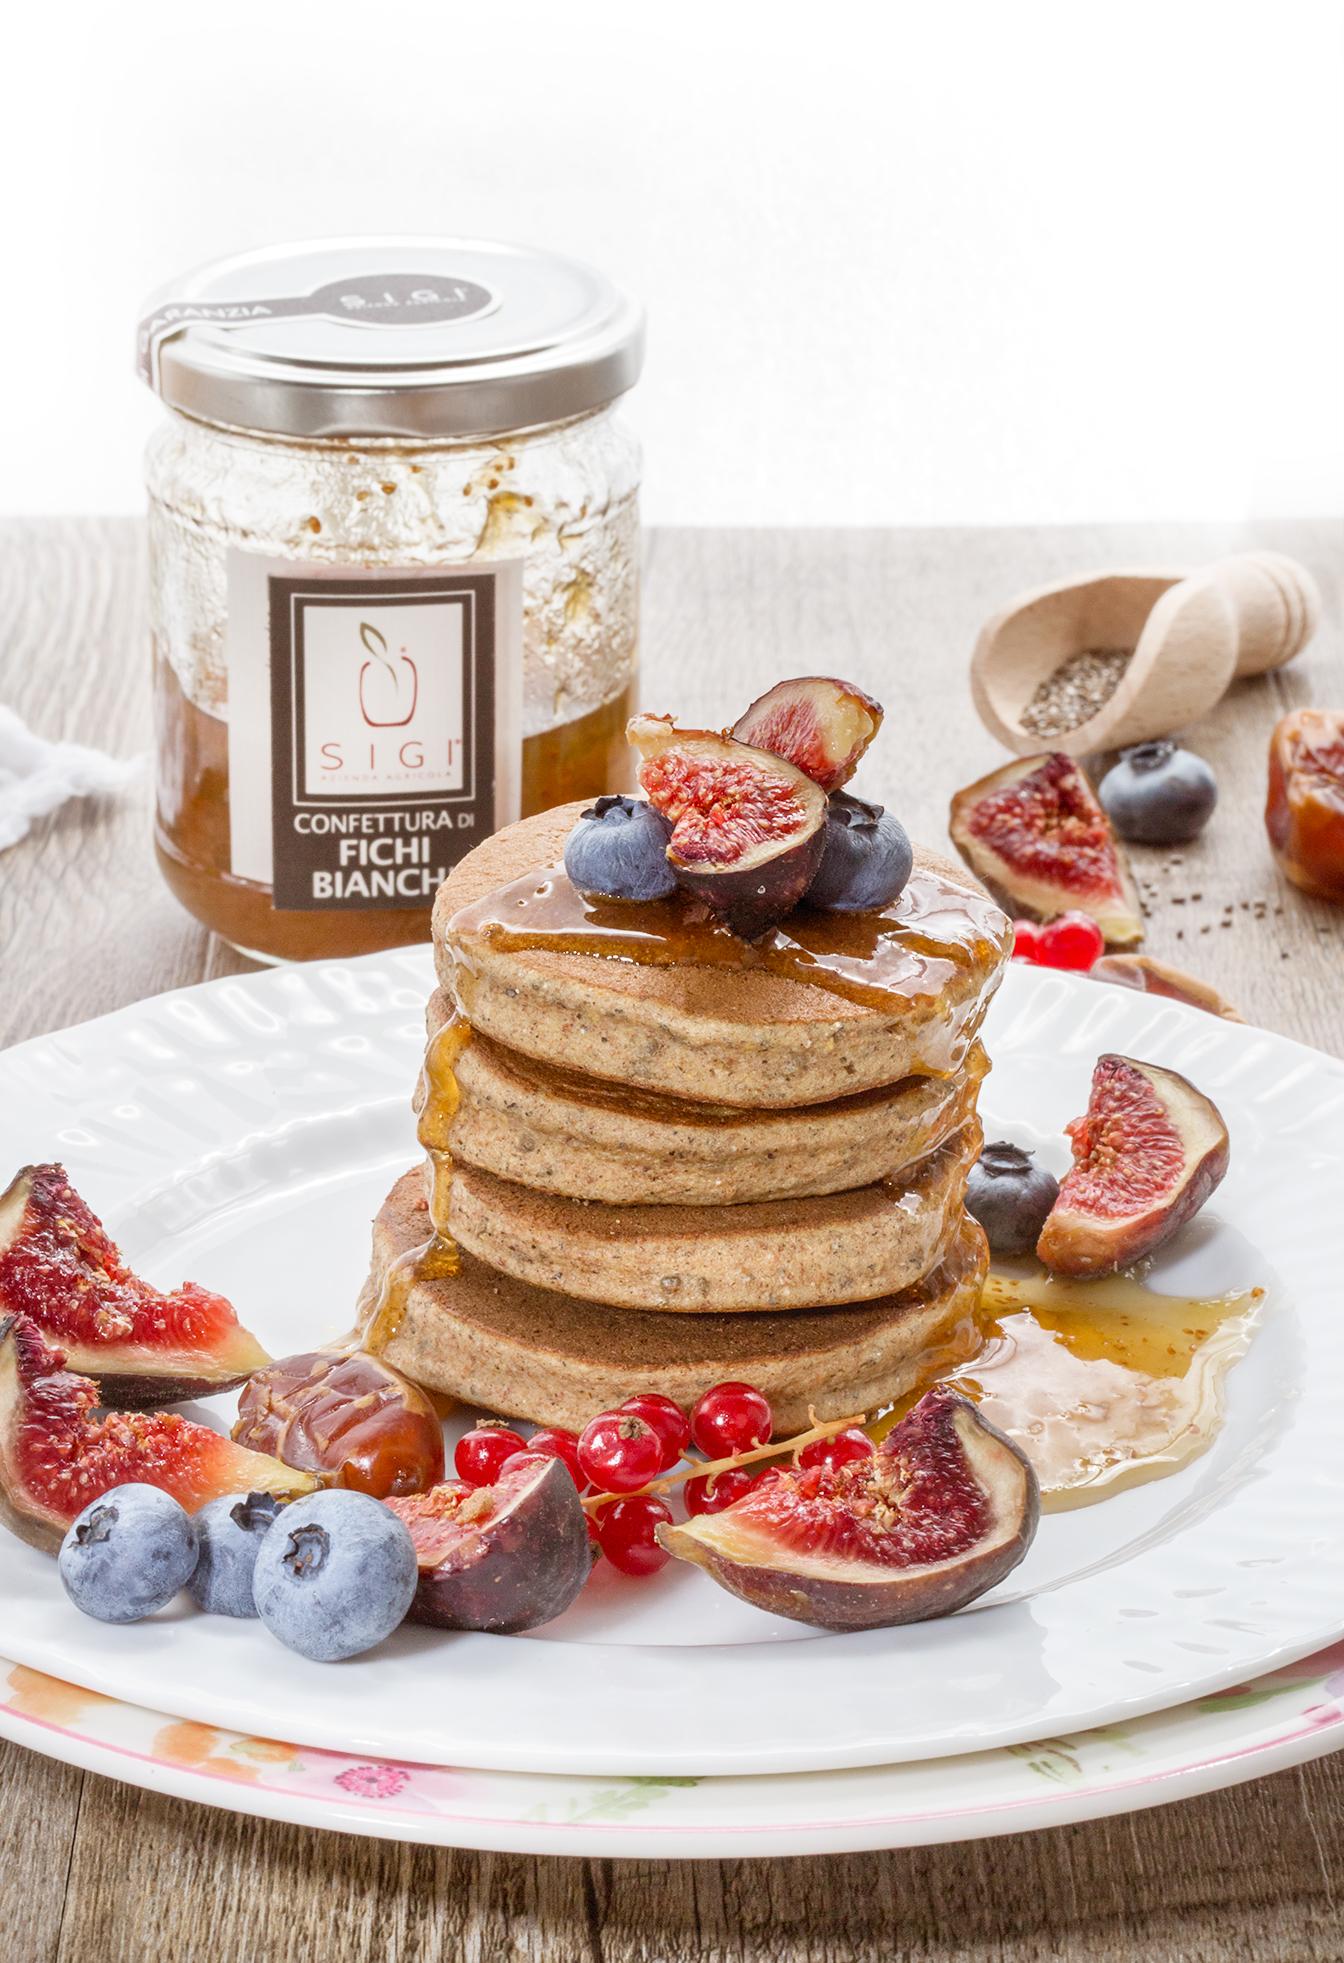 pancakes grano saraceno vegan senza glutine ai datteri  | vegan glutenfree buckwheat pancakes with figs marmalade